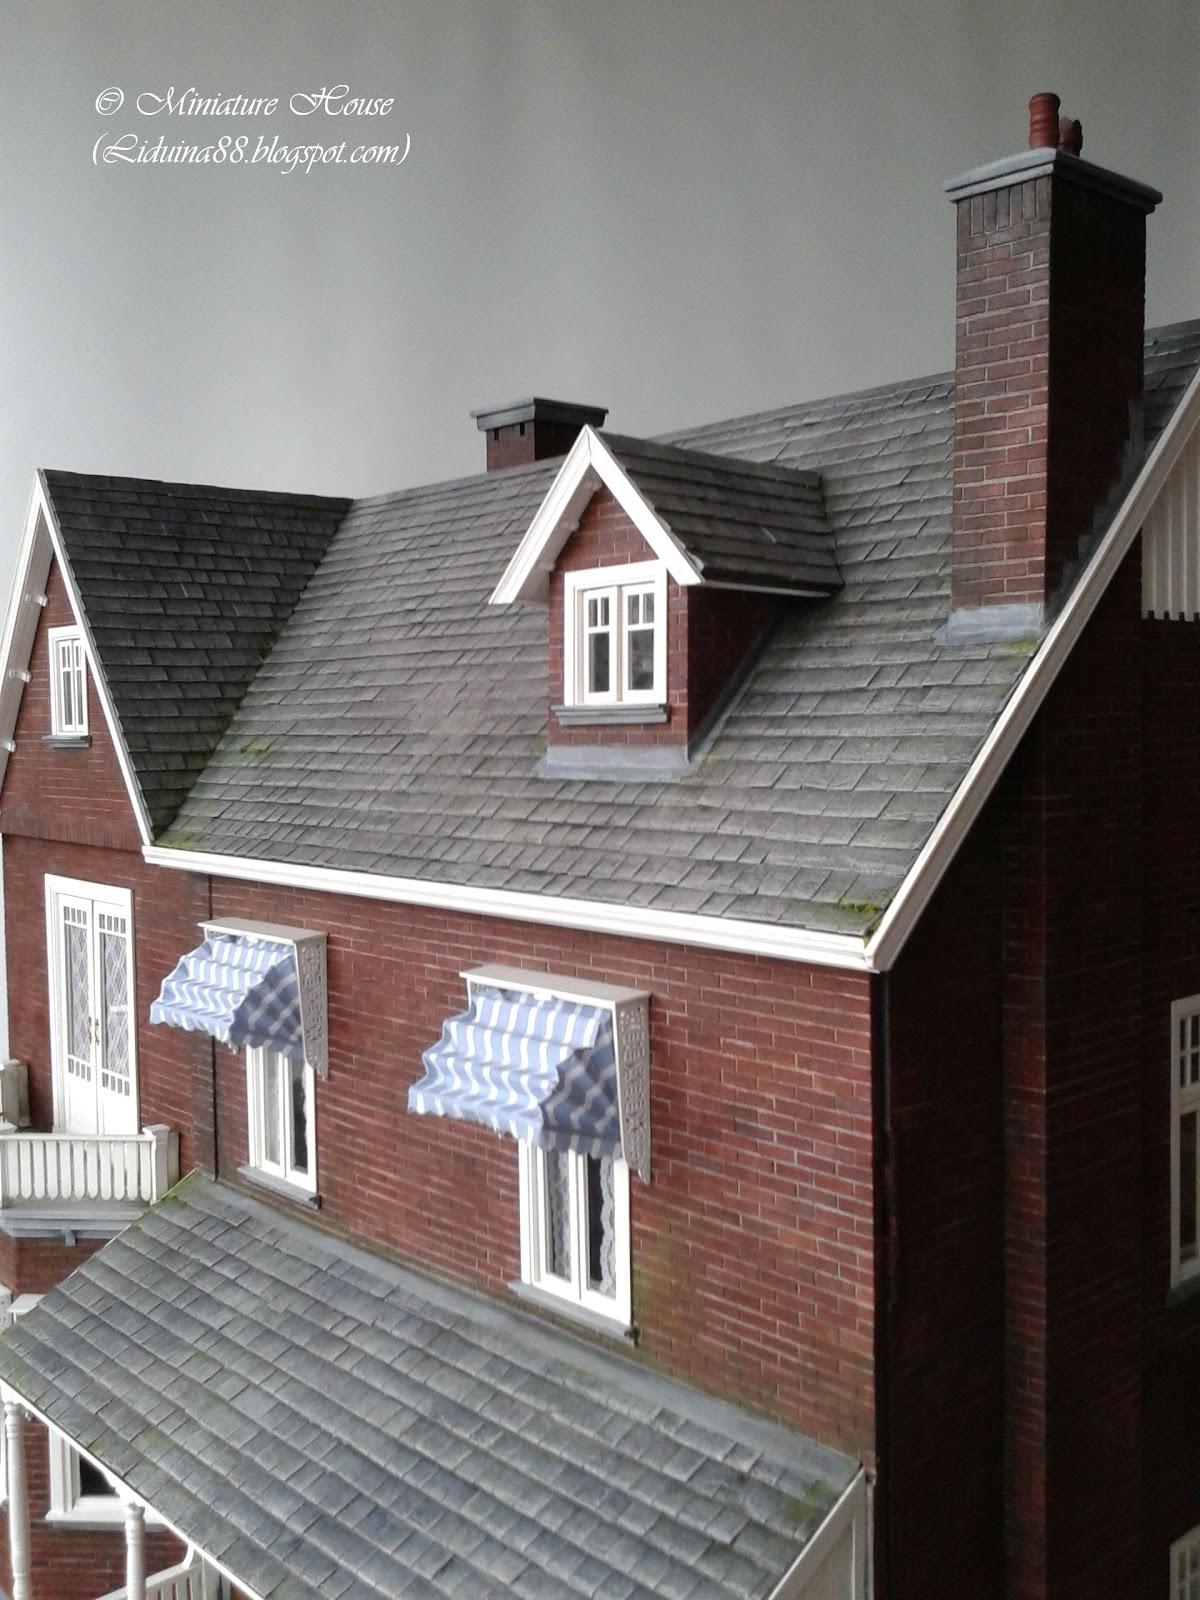 Miniature House Chimneys